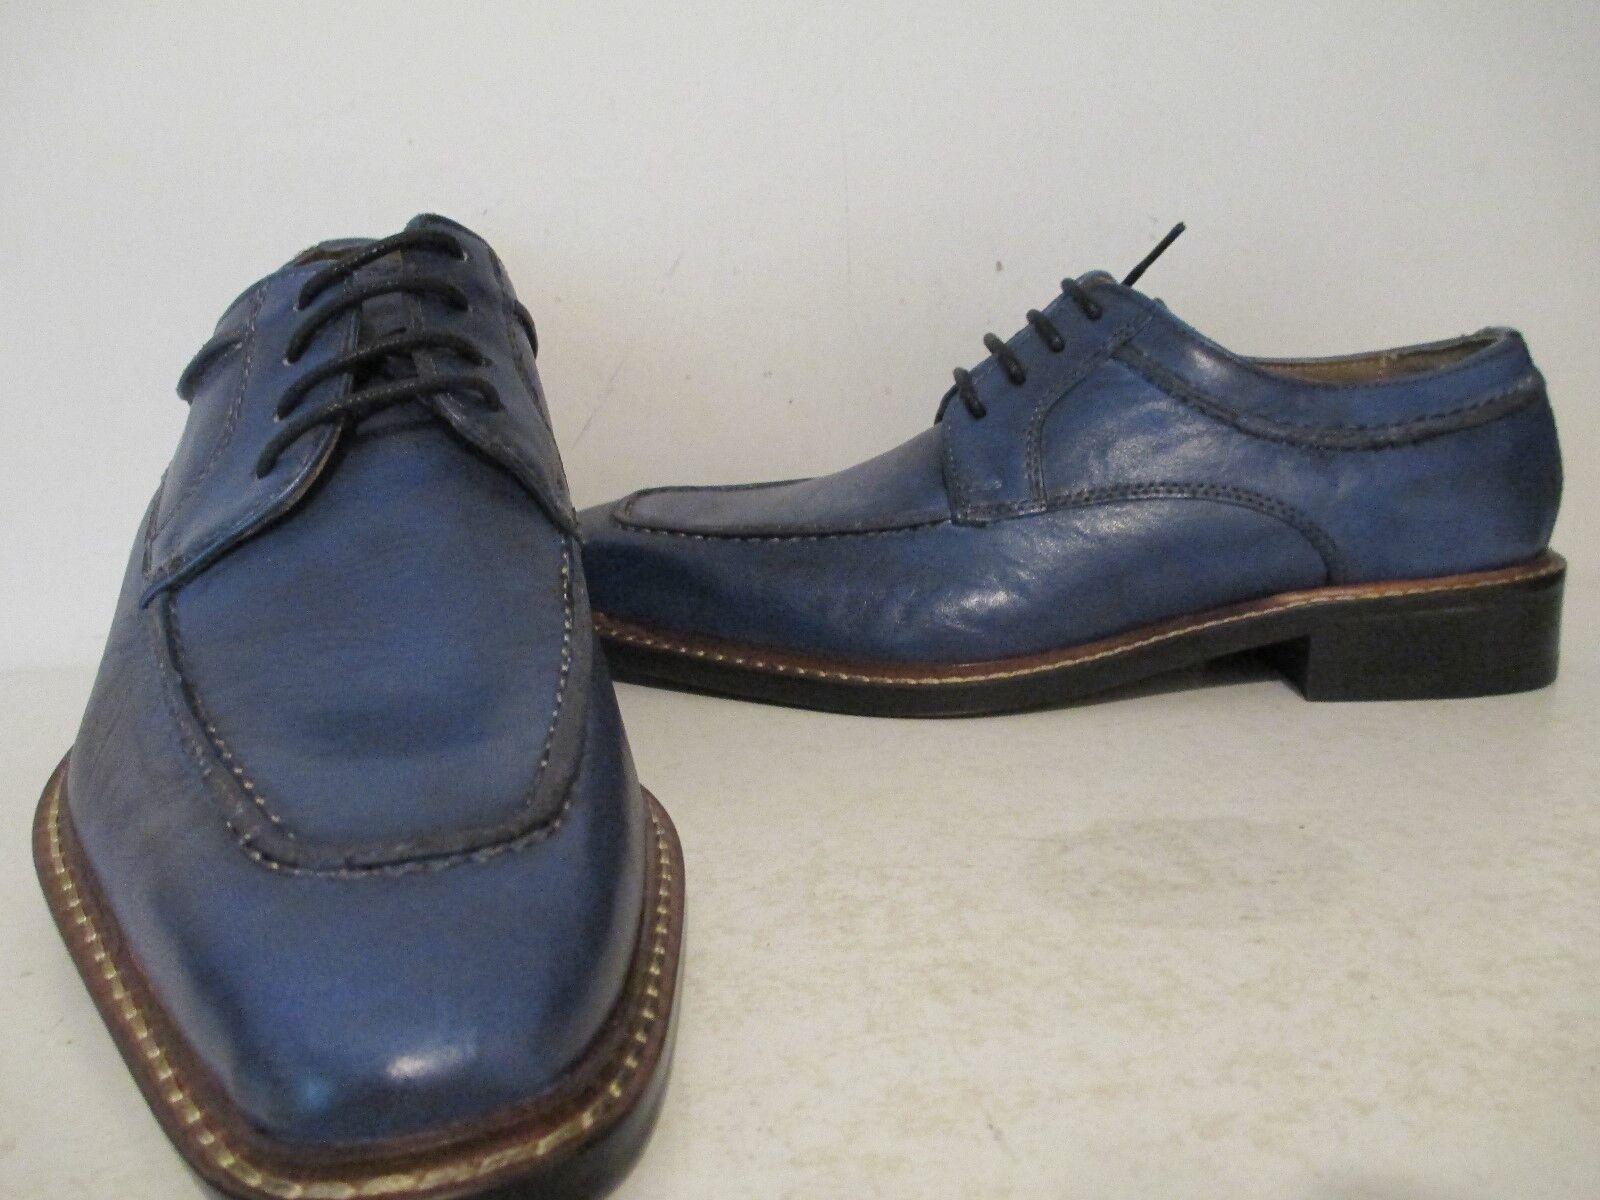 Giorgio Brutini Uomo Nelson 25033 Pelle Moc Toe Oxford Dress Shoe Blue Sz 7.5